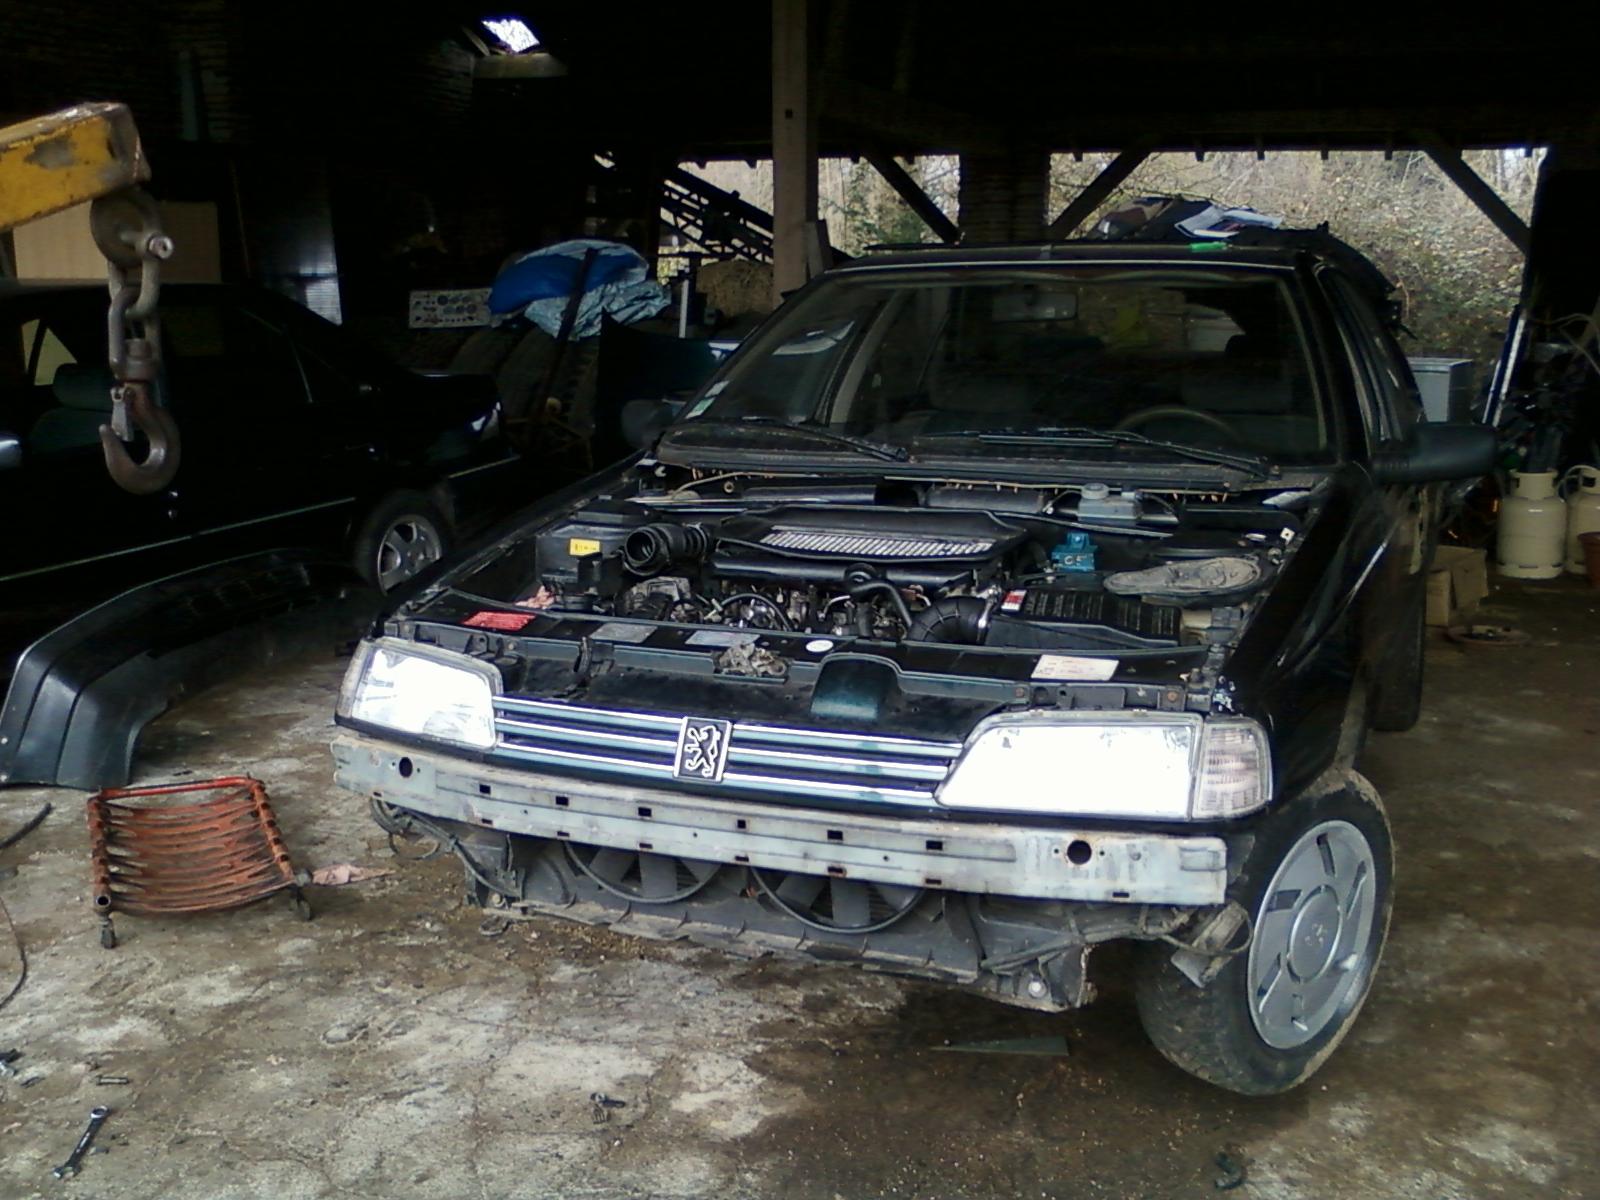 Changement moteur XUD7TE Peugeot 405 SRD turbo de Jordan. - Page 2 949351SPMA0052jpg